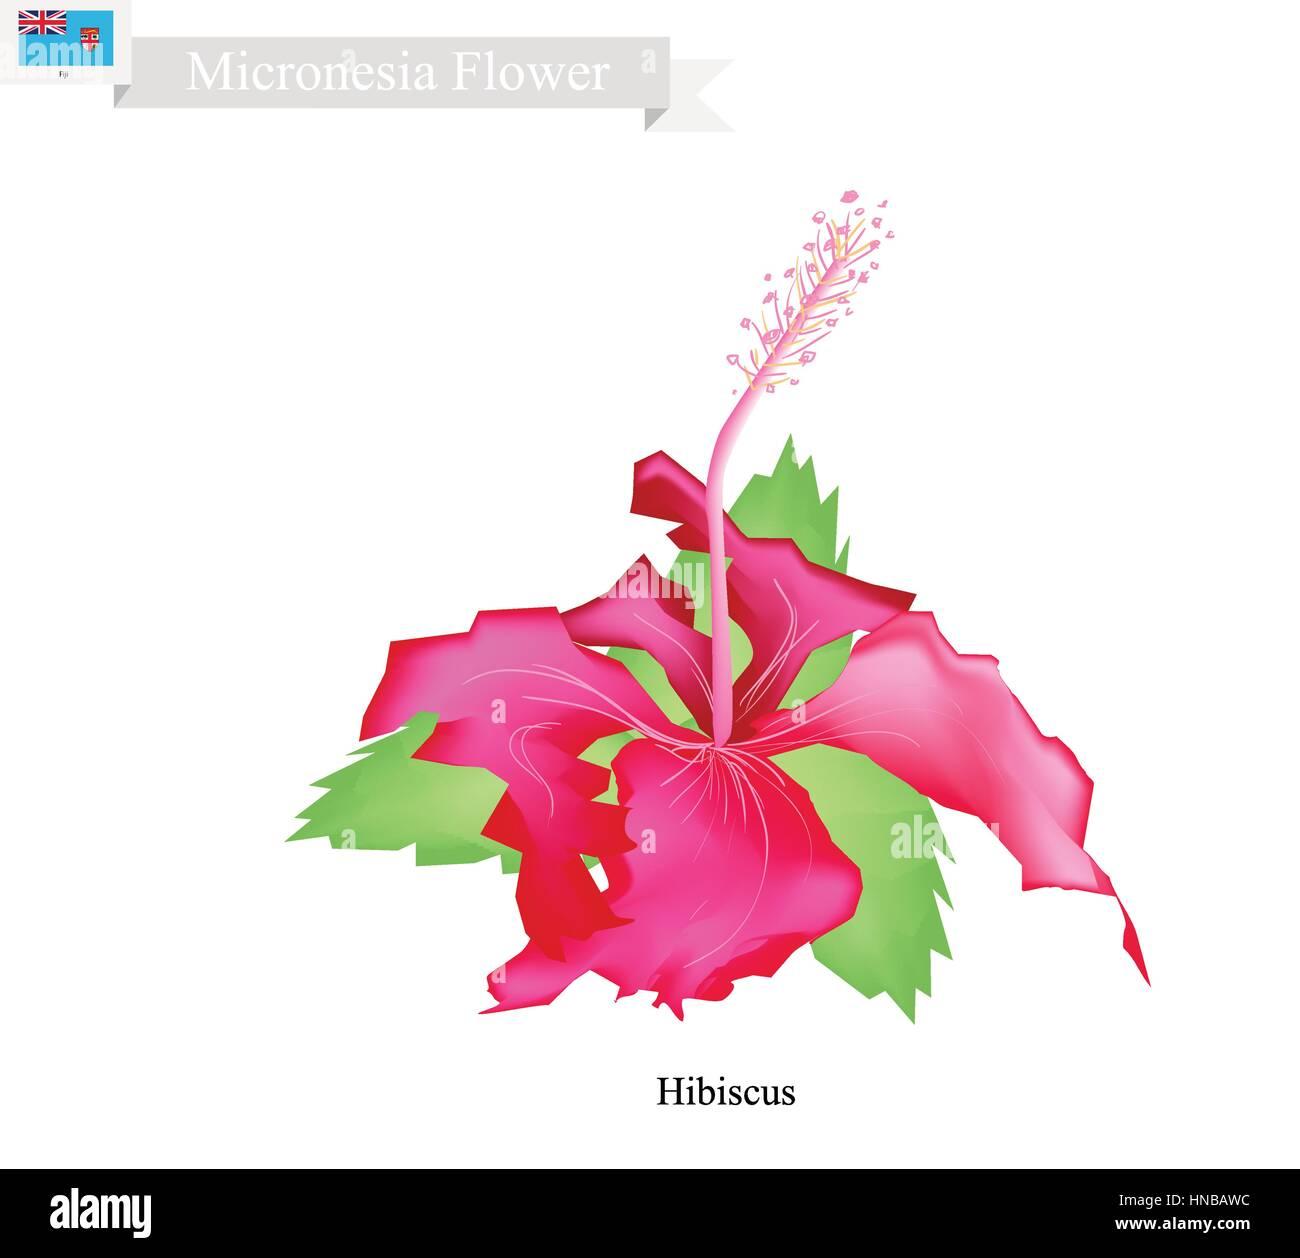 Micronesia flower illustration of hibiscus flowers the national micronesia flower illustration of hibiscus flowers the national flower of federated states of micronesia izmirmasajfo